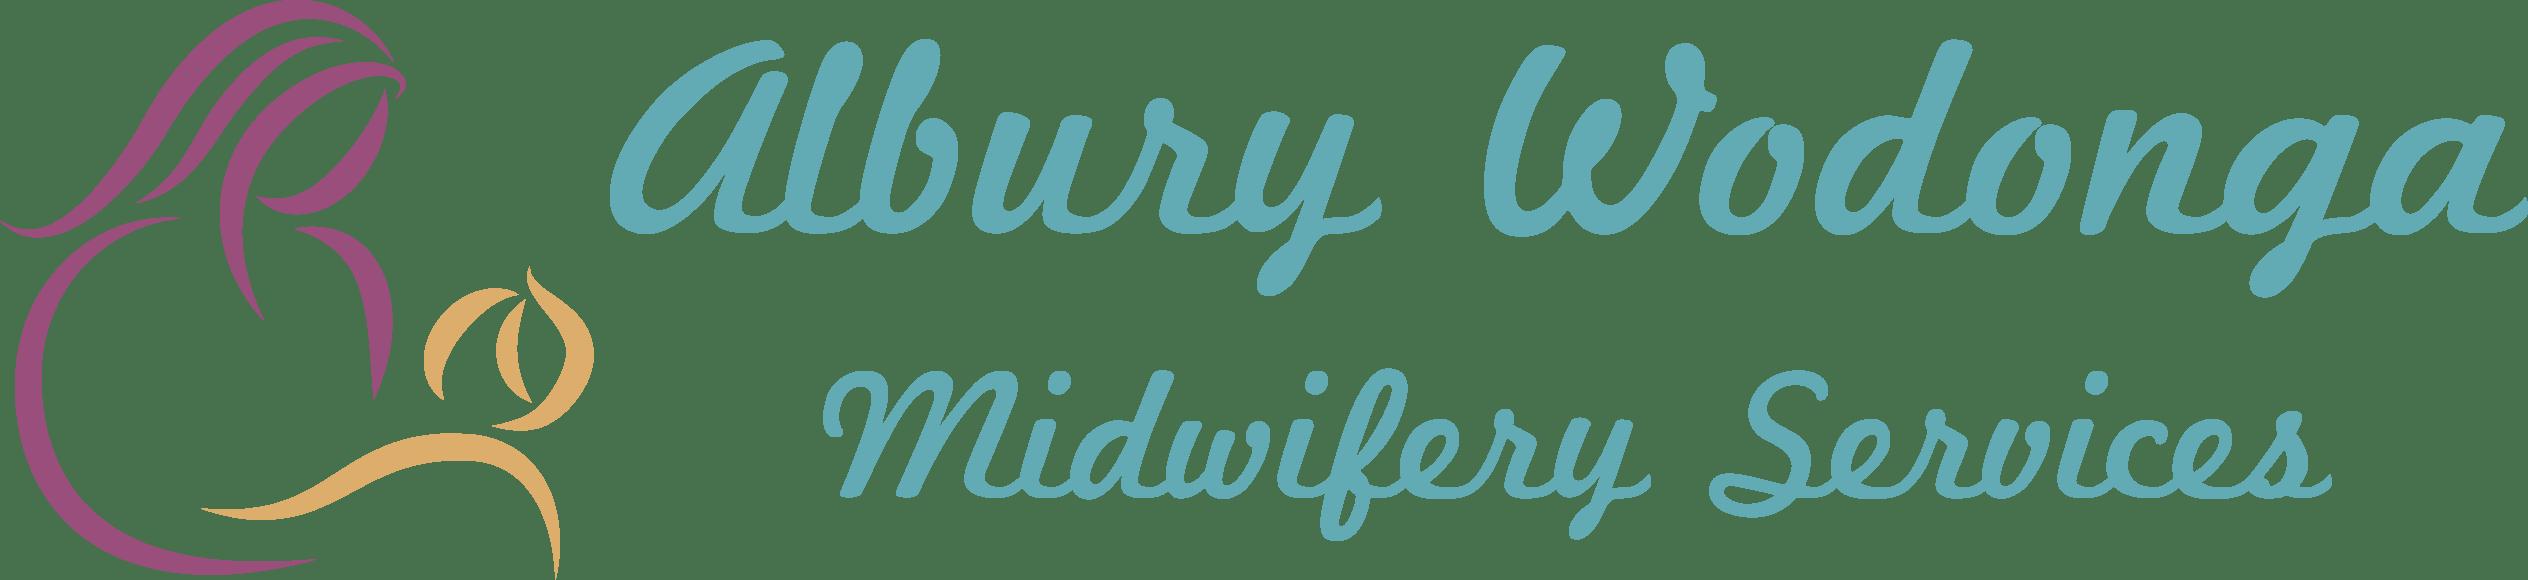 AW Midwifery